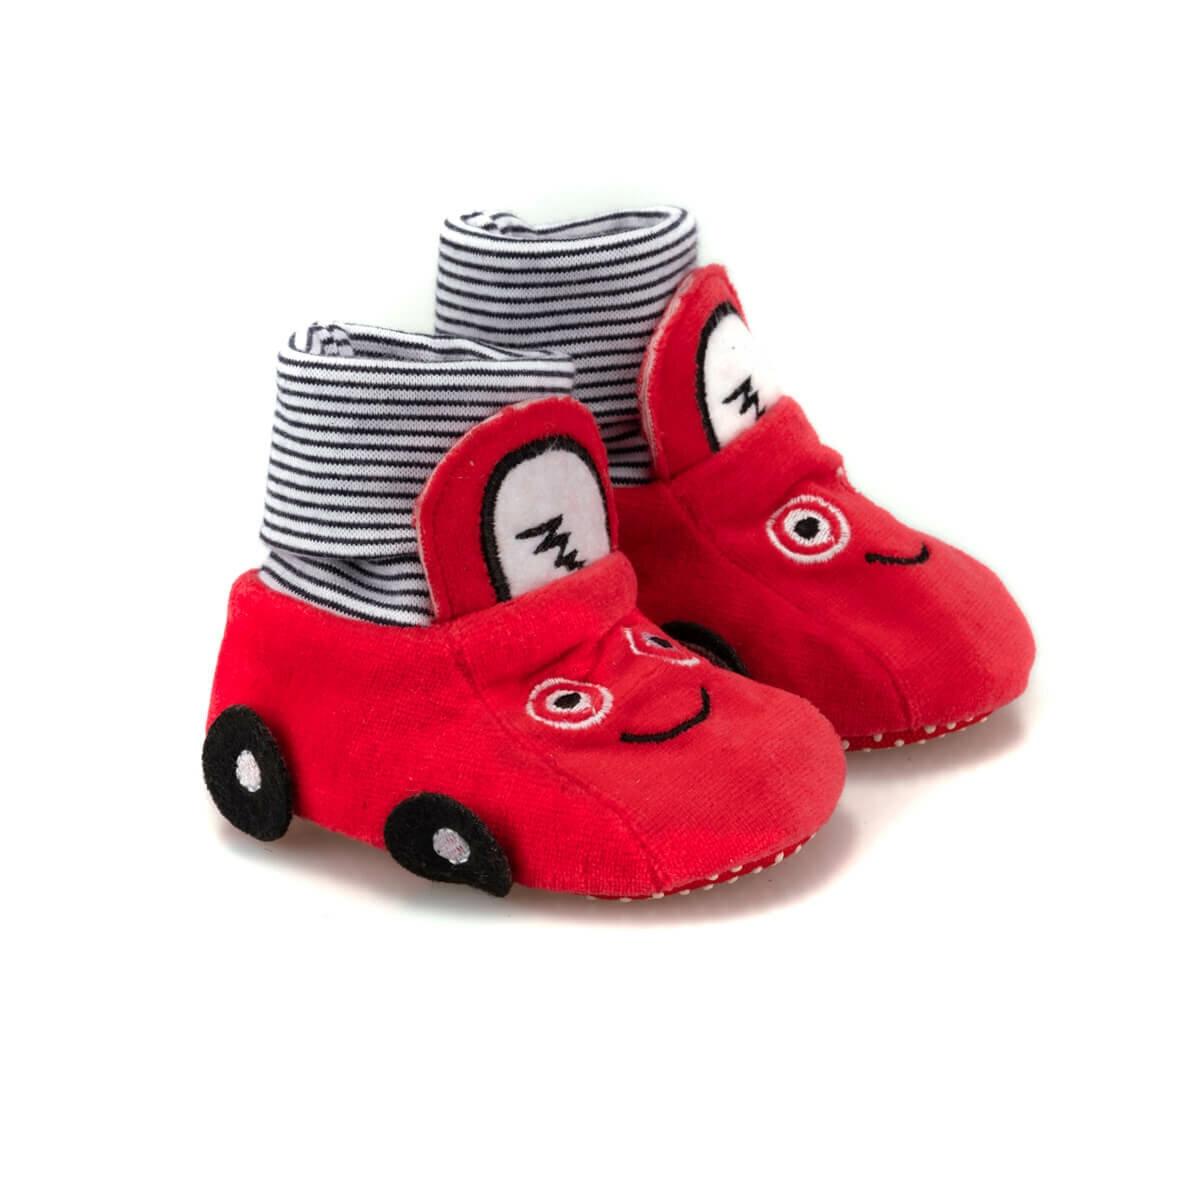 FLO 92.512037.Y Red Male Child Home Shoe Polaris